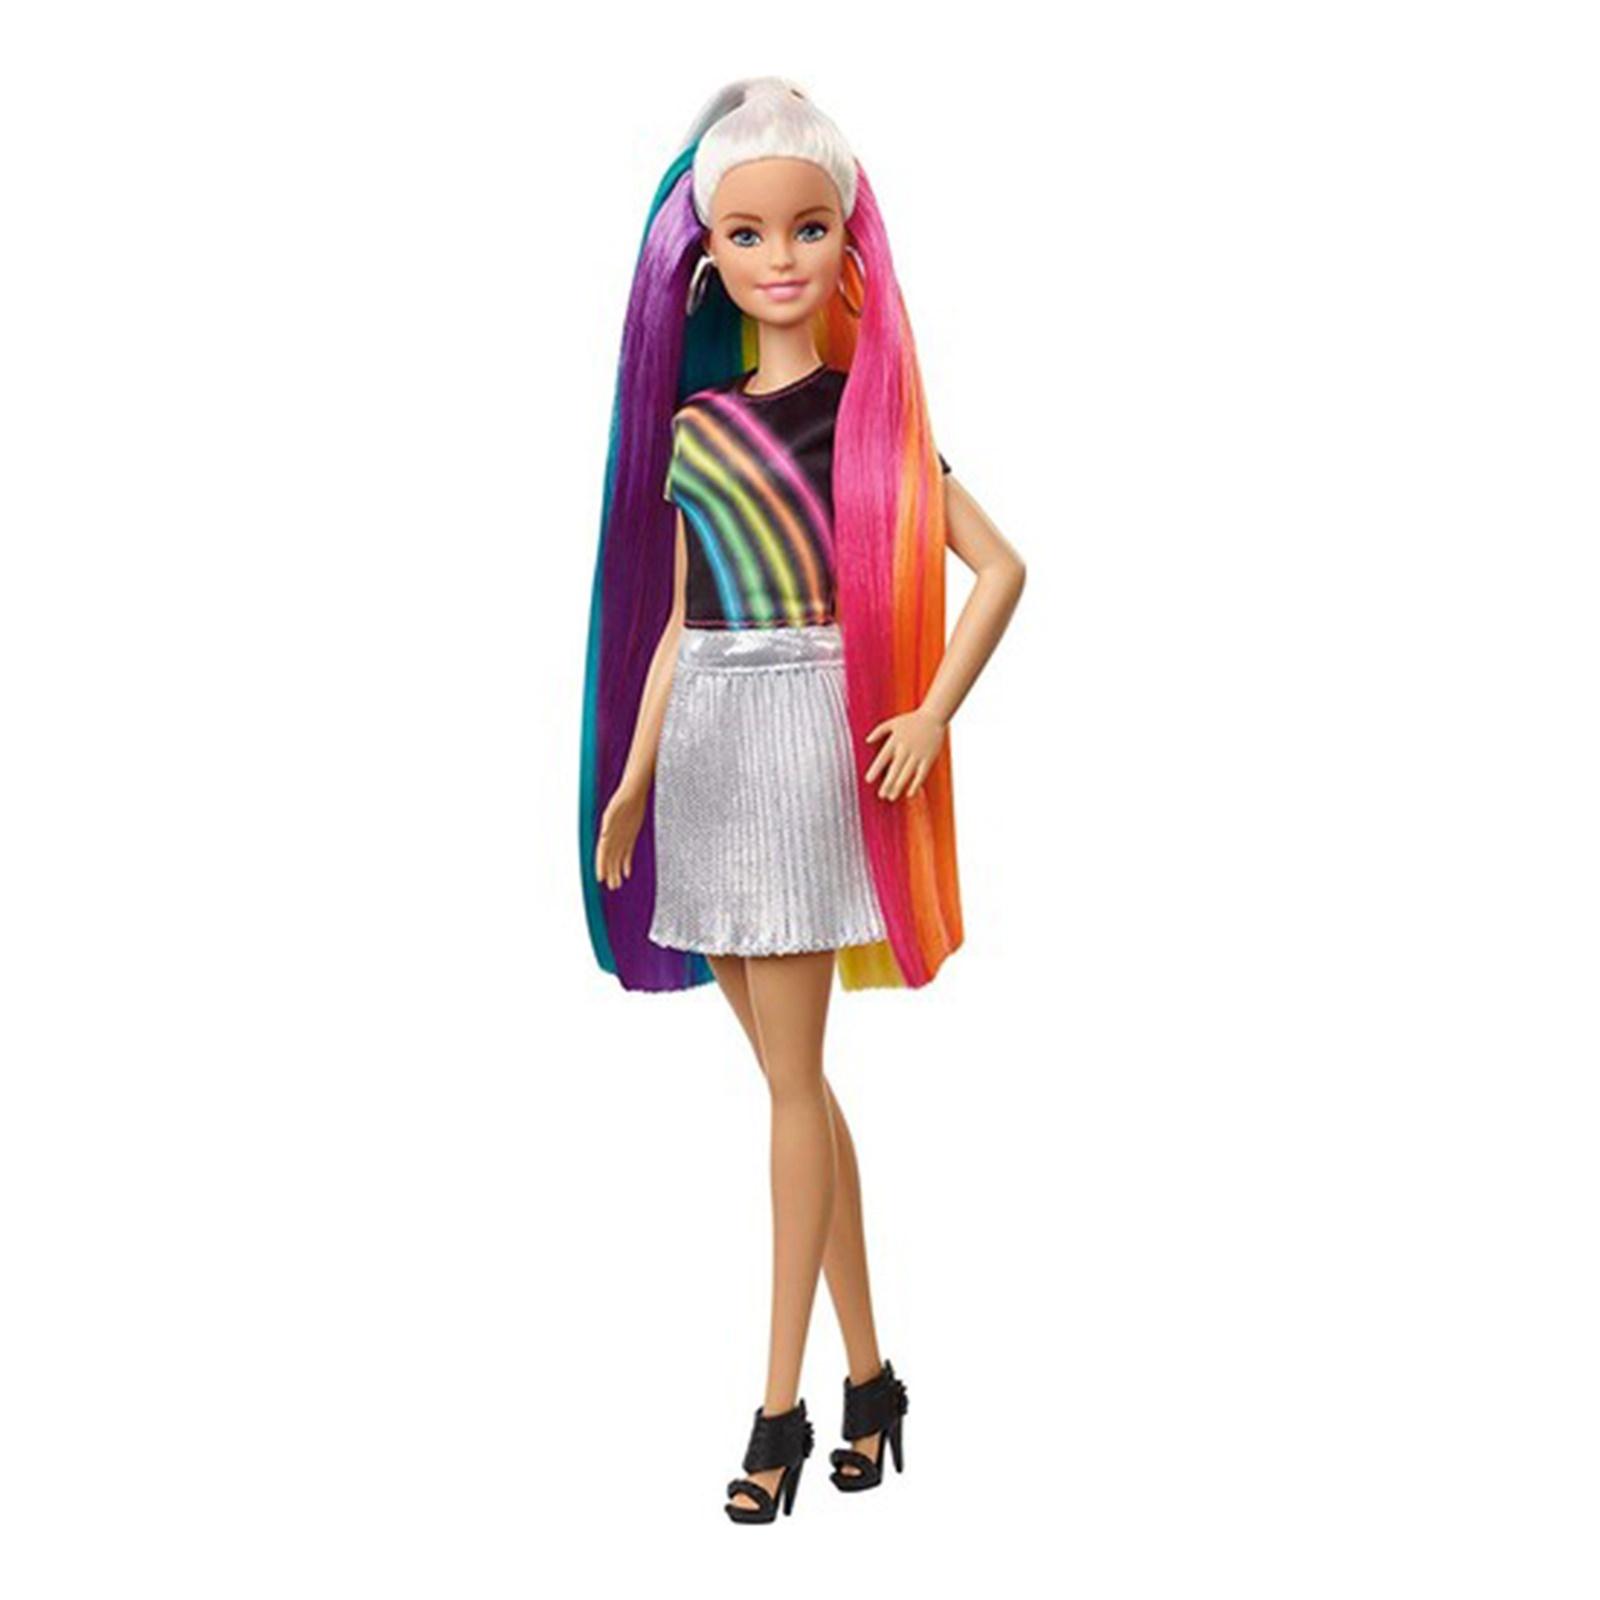 Barbie Gokkusagi Renkli Saclar Bebegi